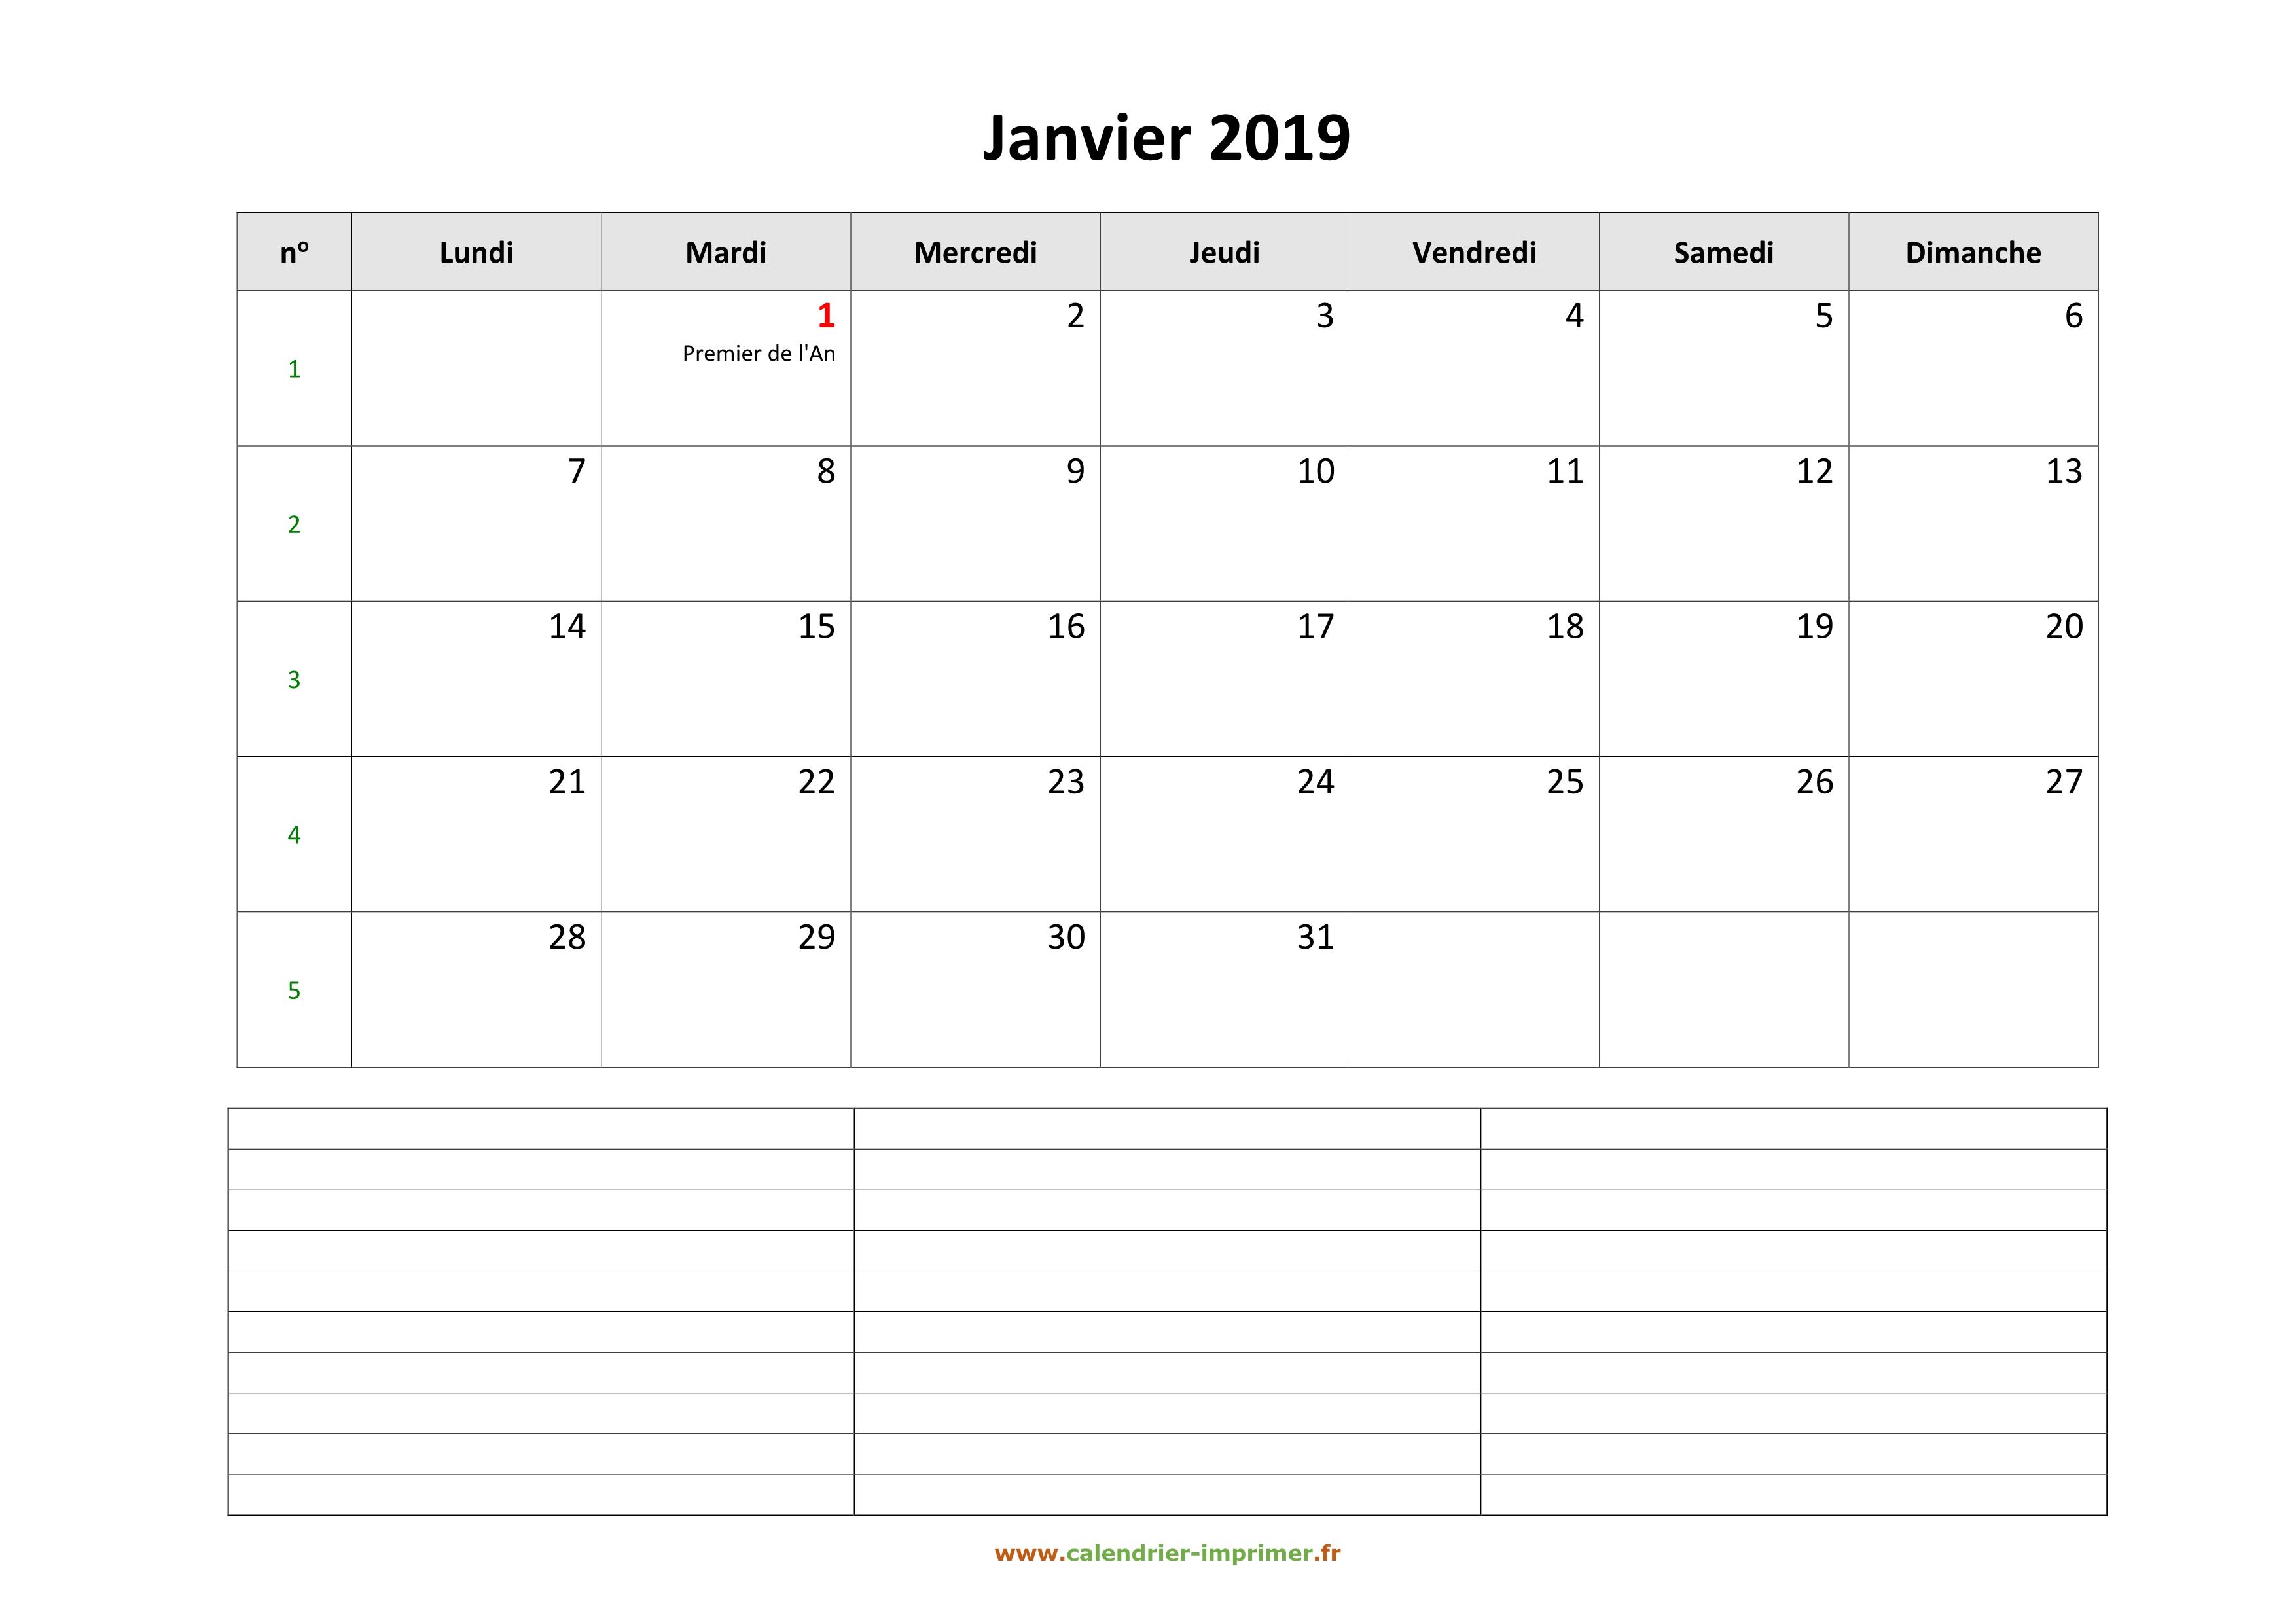 Calendrier A Imprimer Janvier 2019.Calendrier Janvier 2019 A Imprimer